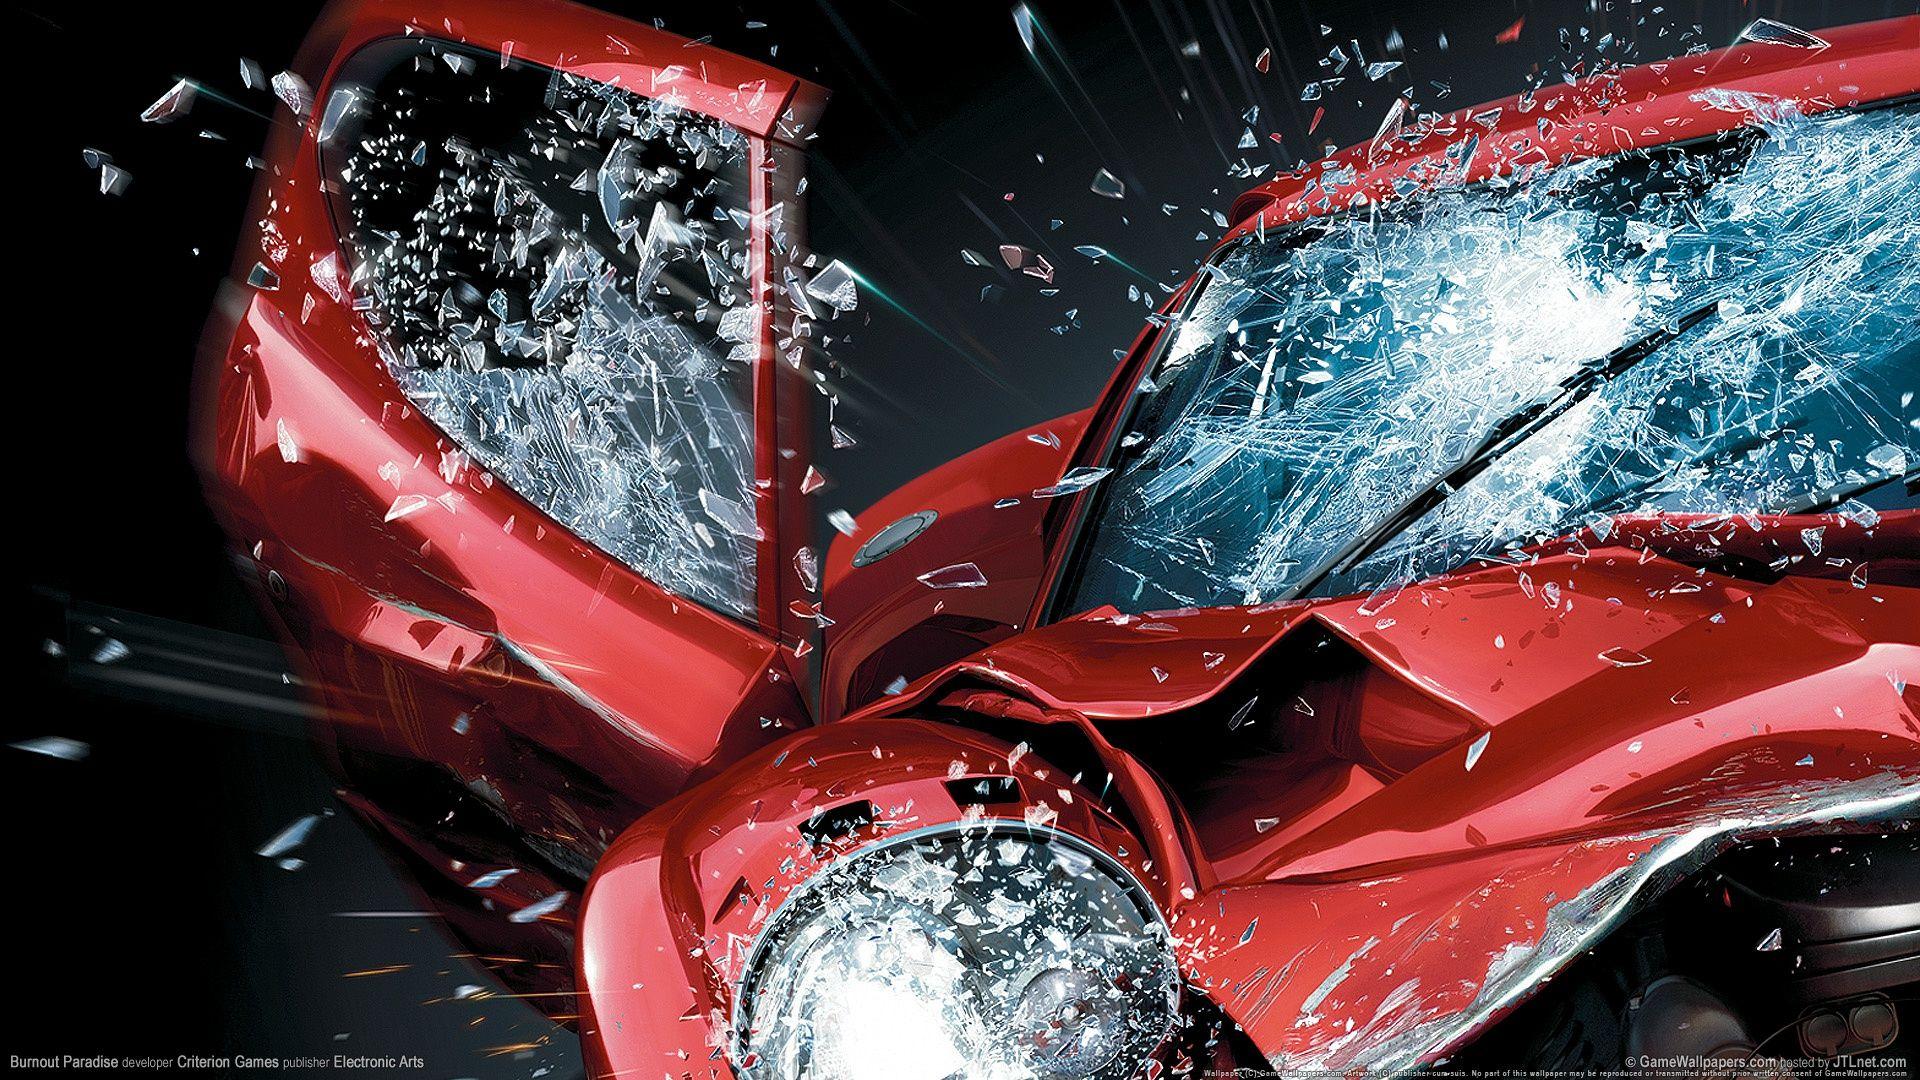 Burnout Paradise Background Widescreen Wallpapers Car Accident Lawyer Auto Collision Car Crash